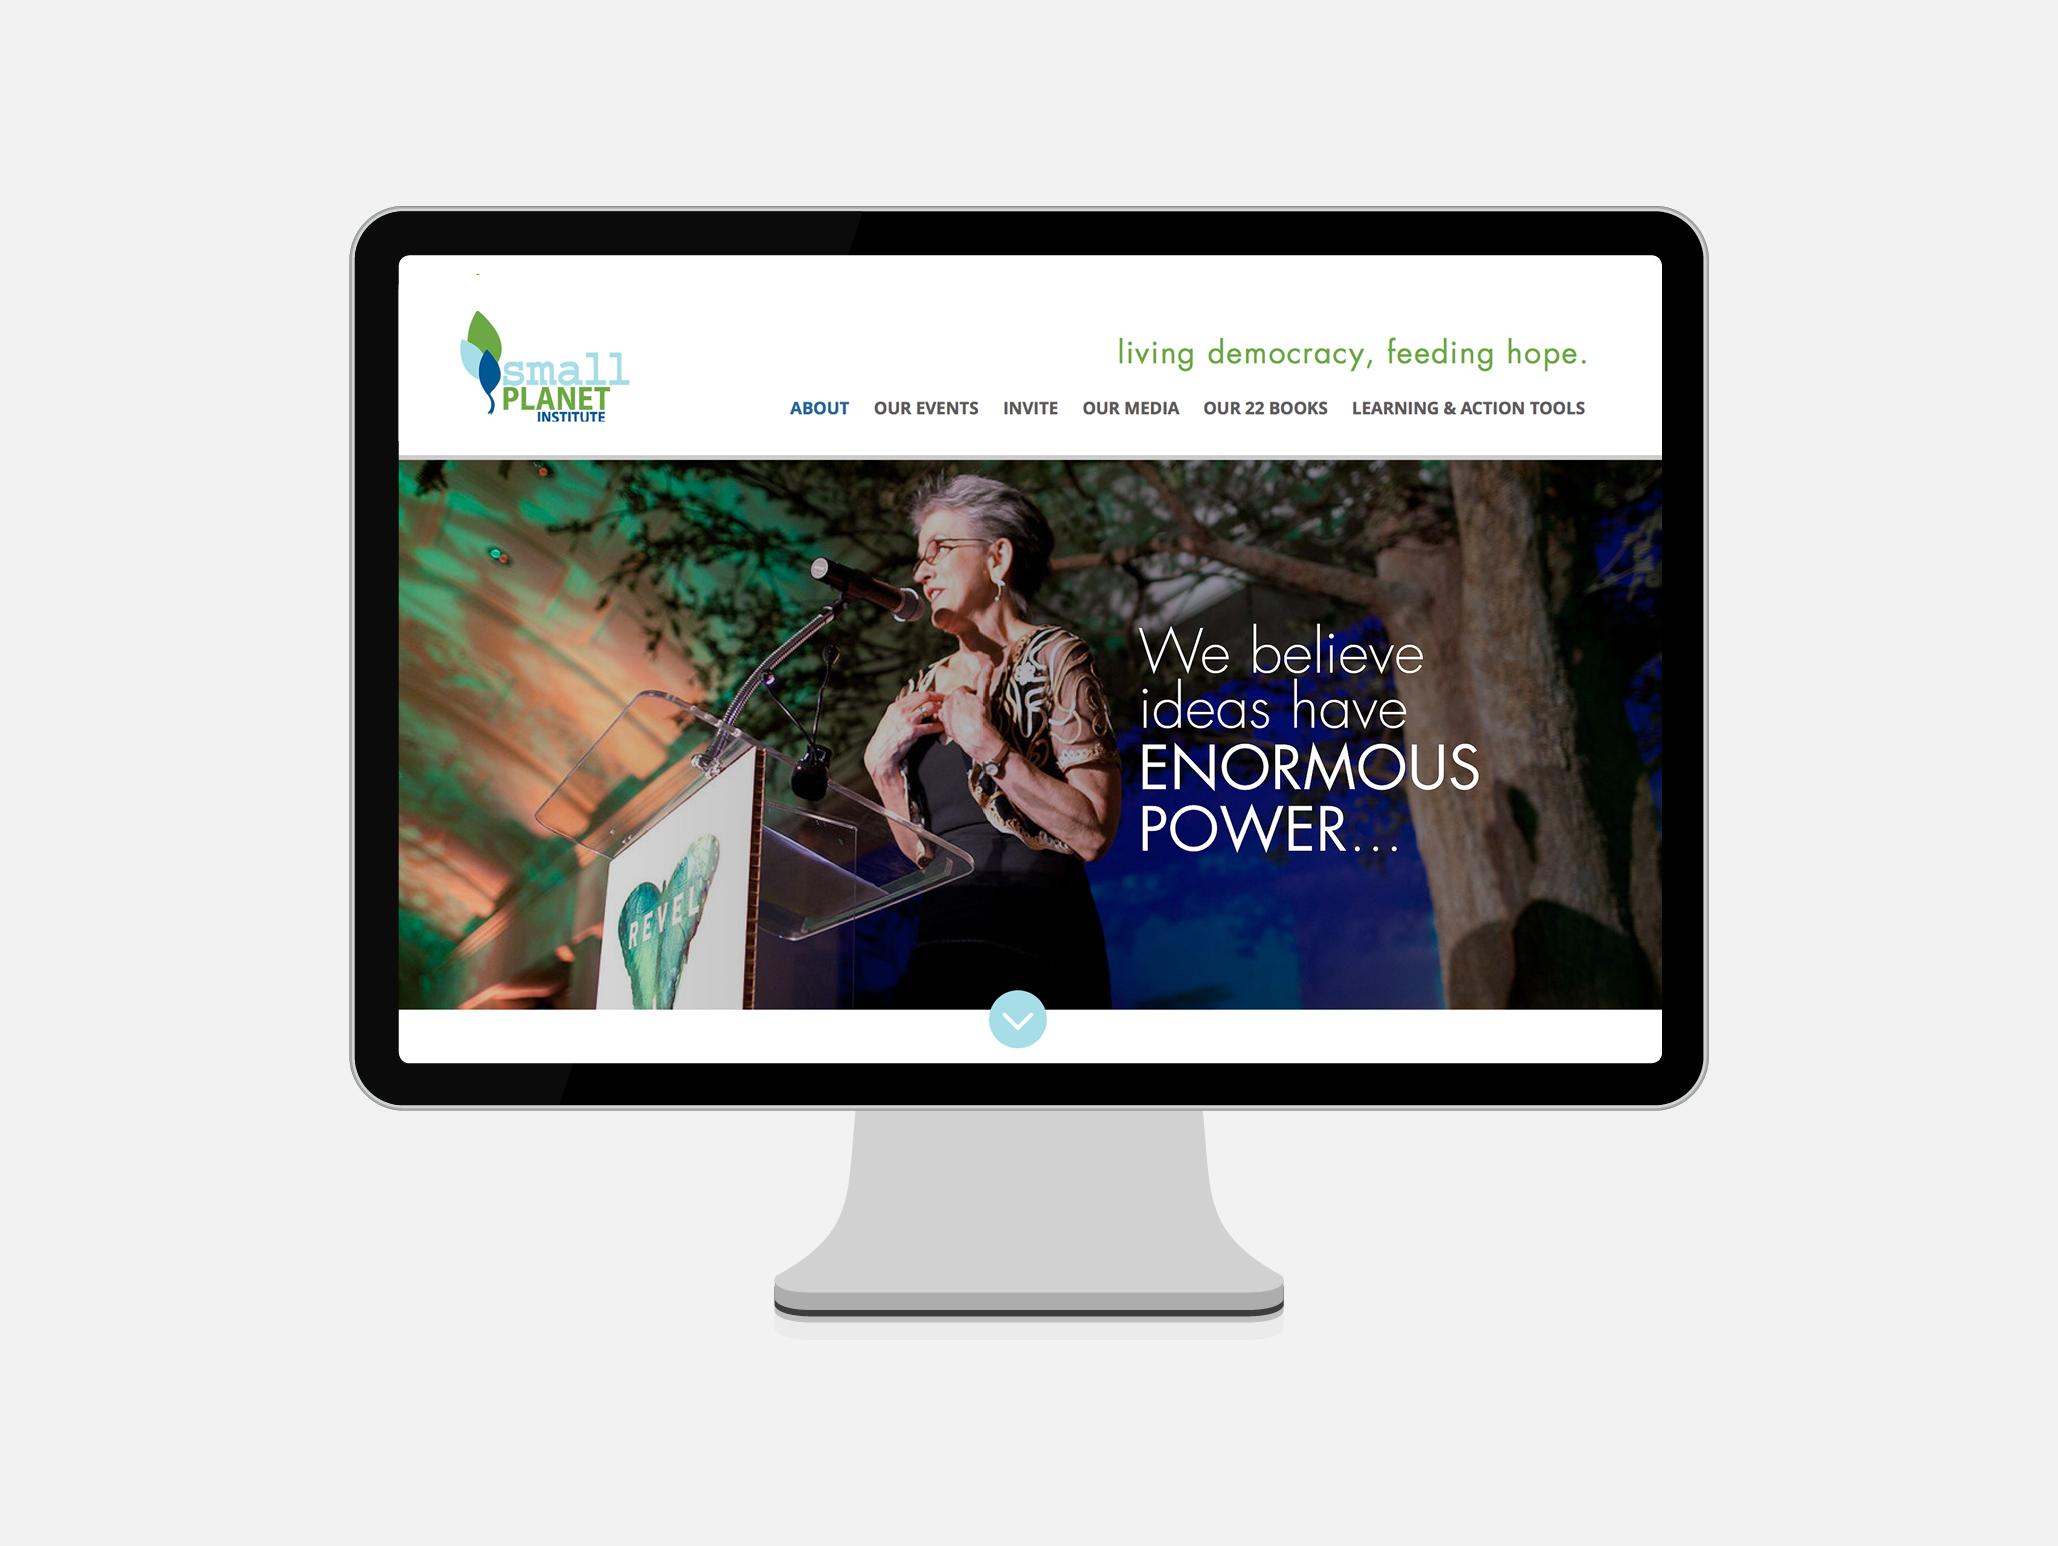 Small Planet Institute Website